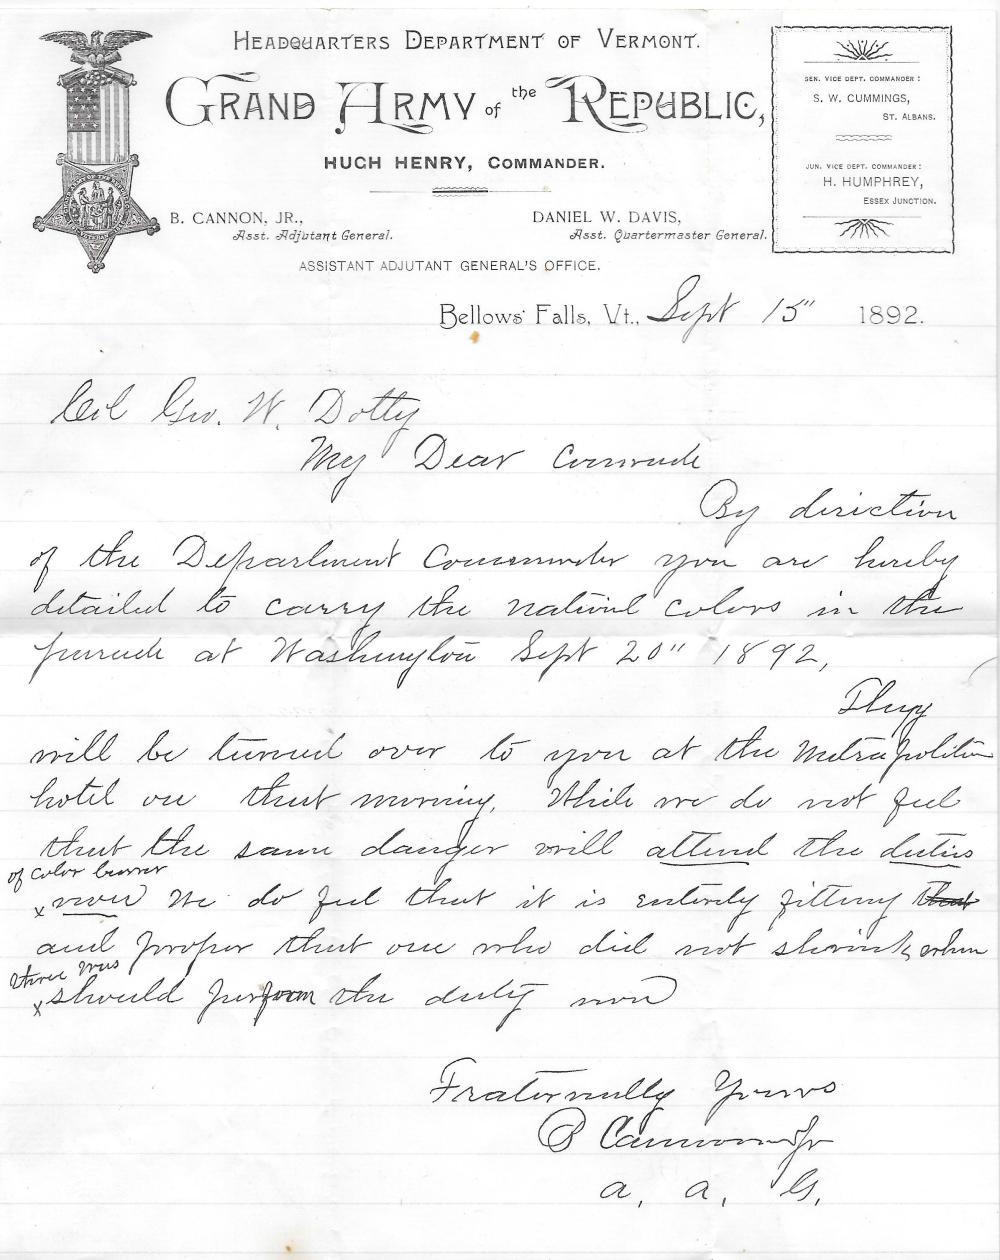 1892 GAR Encampment letter, Col. Doty